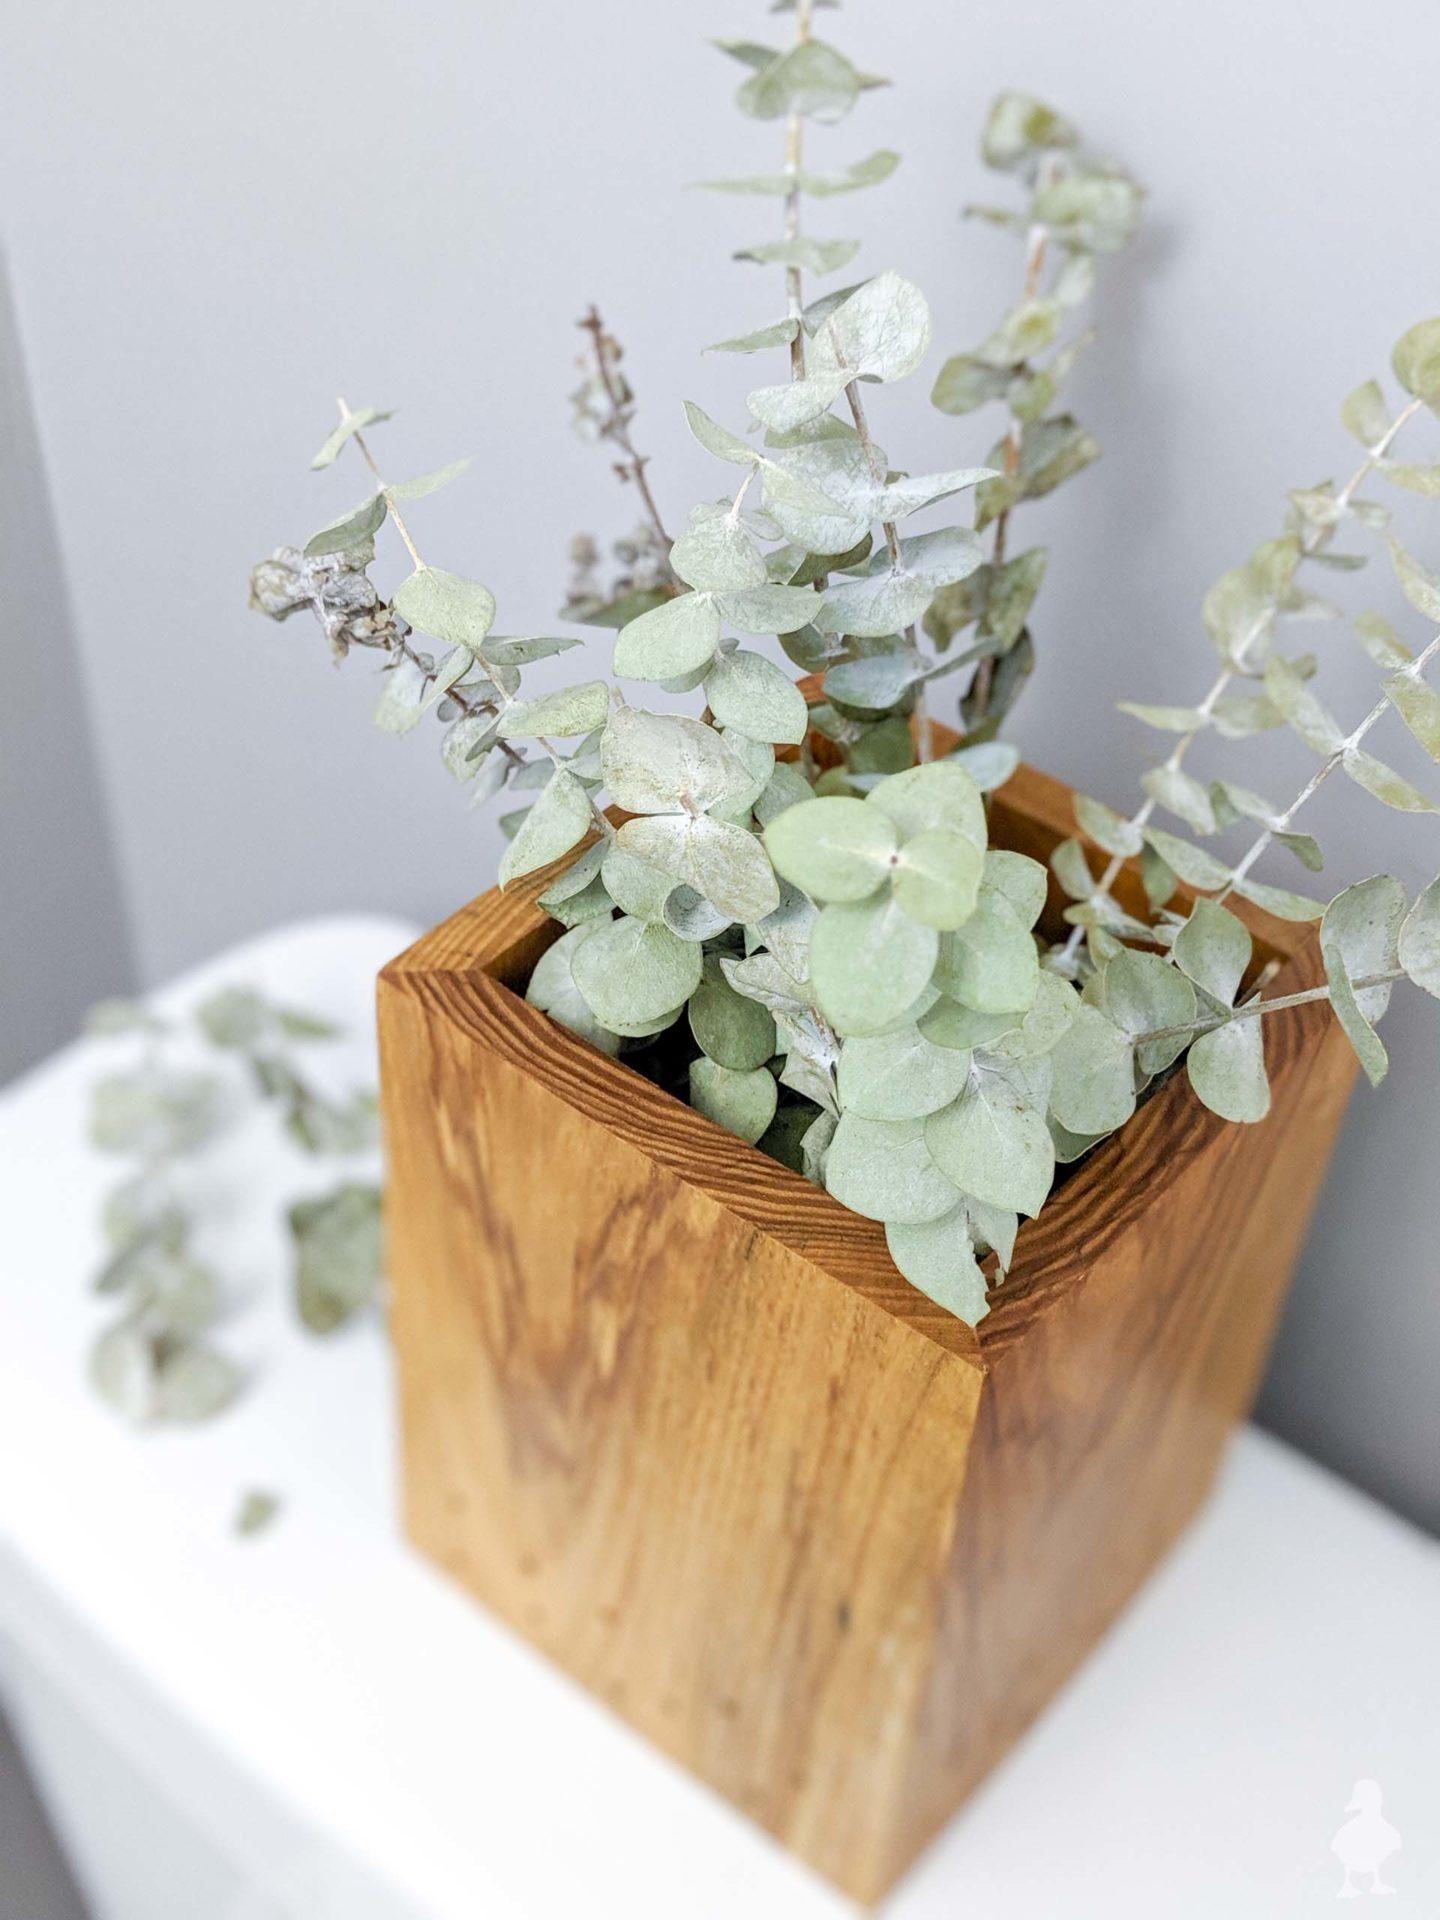 diy bathroom baking soda deodorizer vase with essential oil and eucalyptus